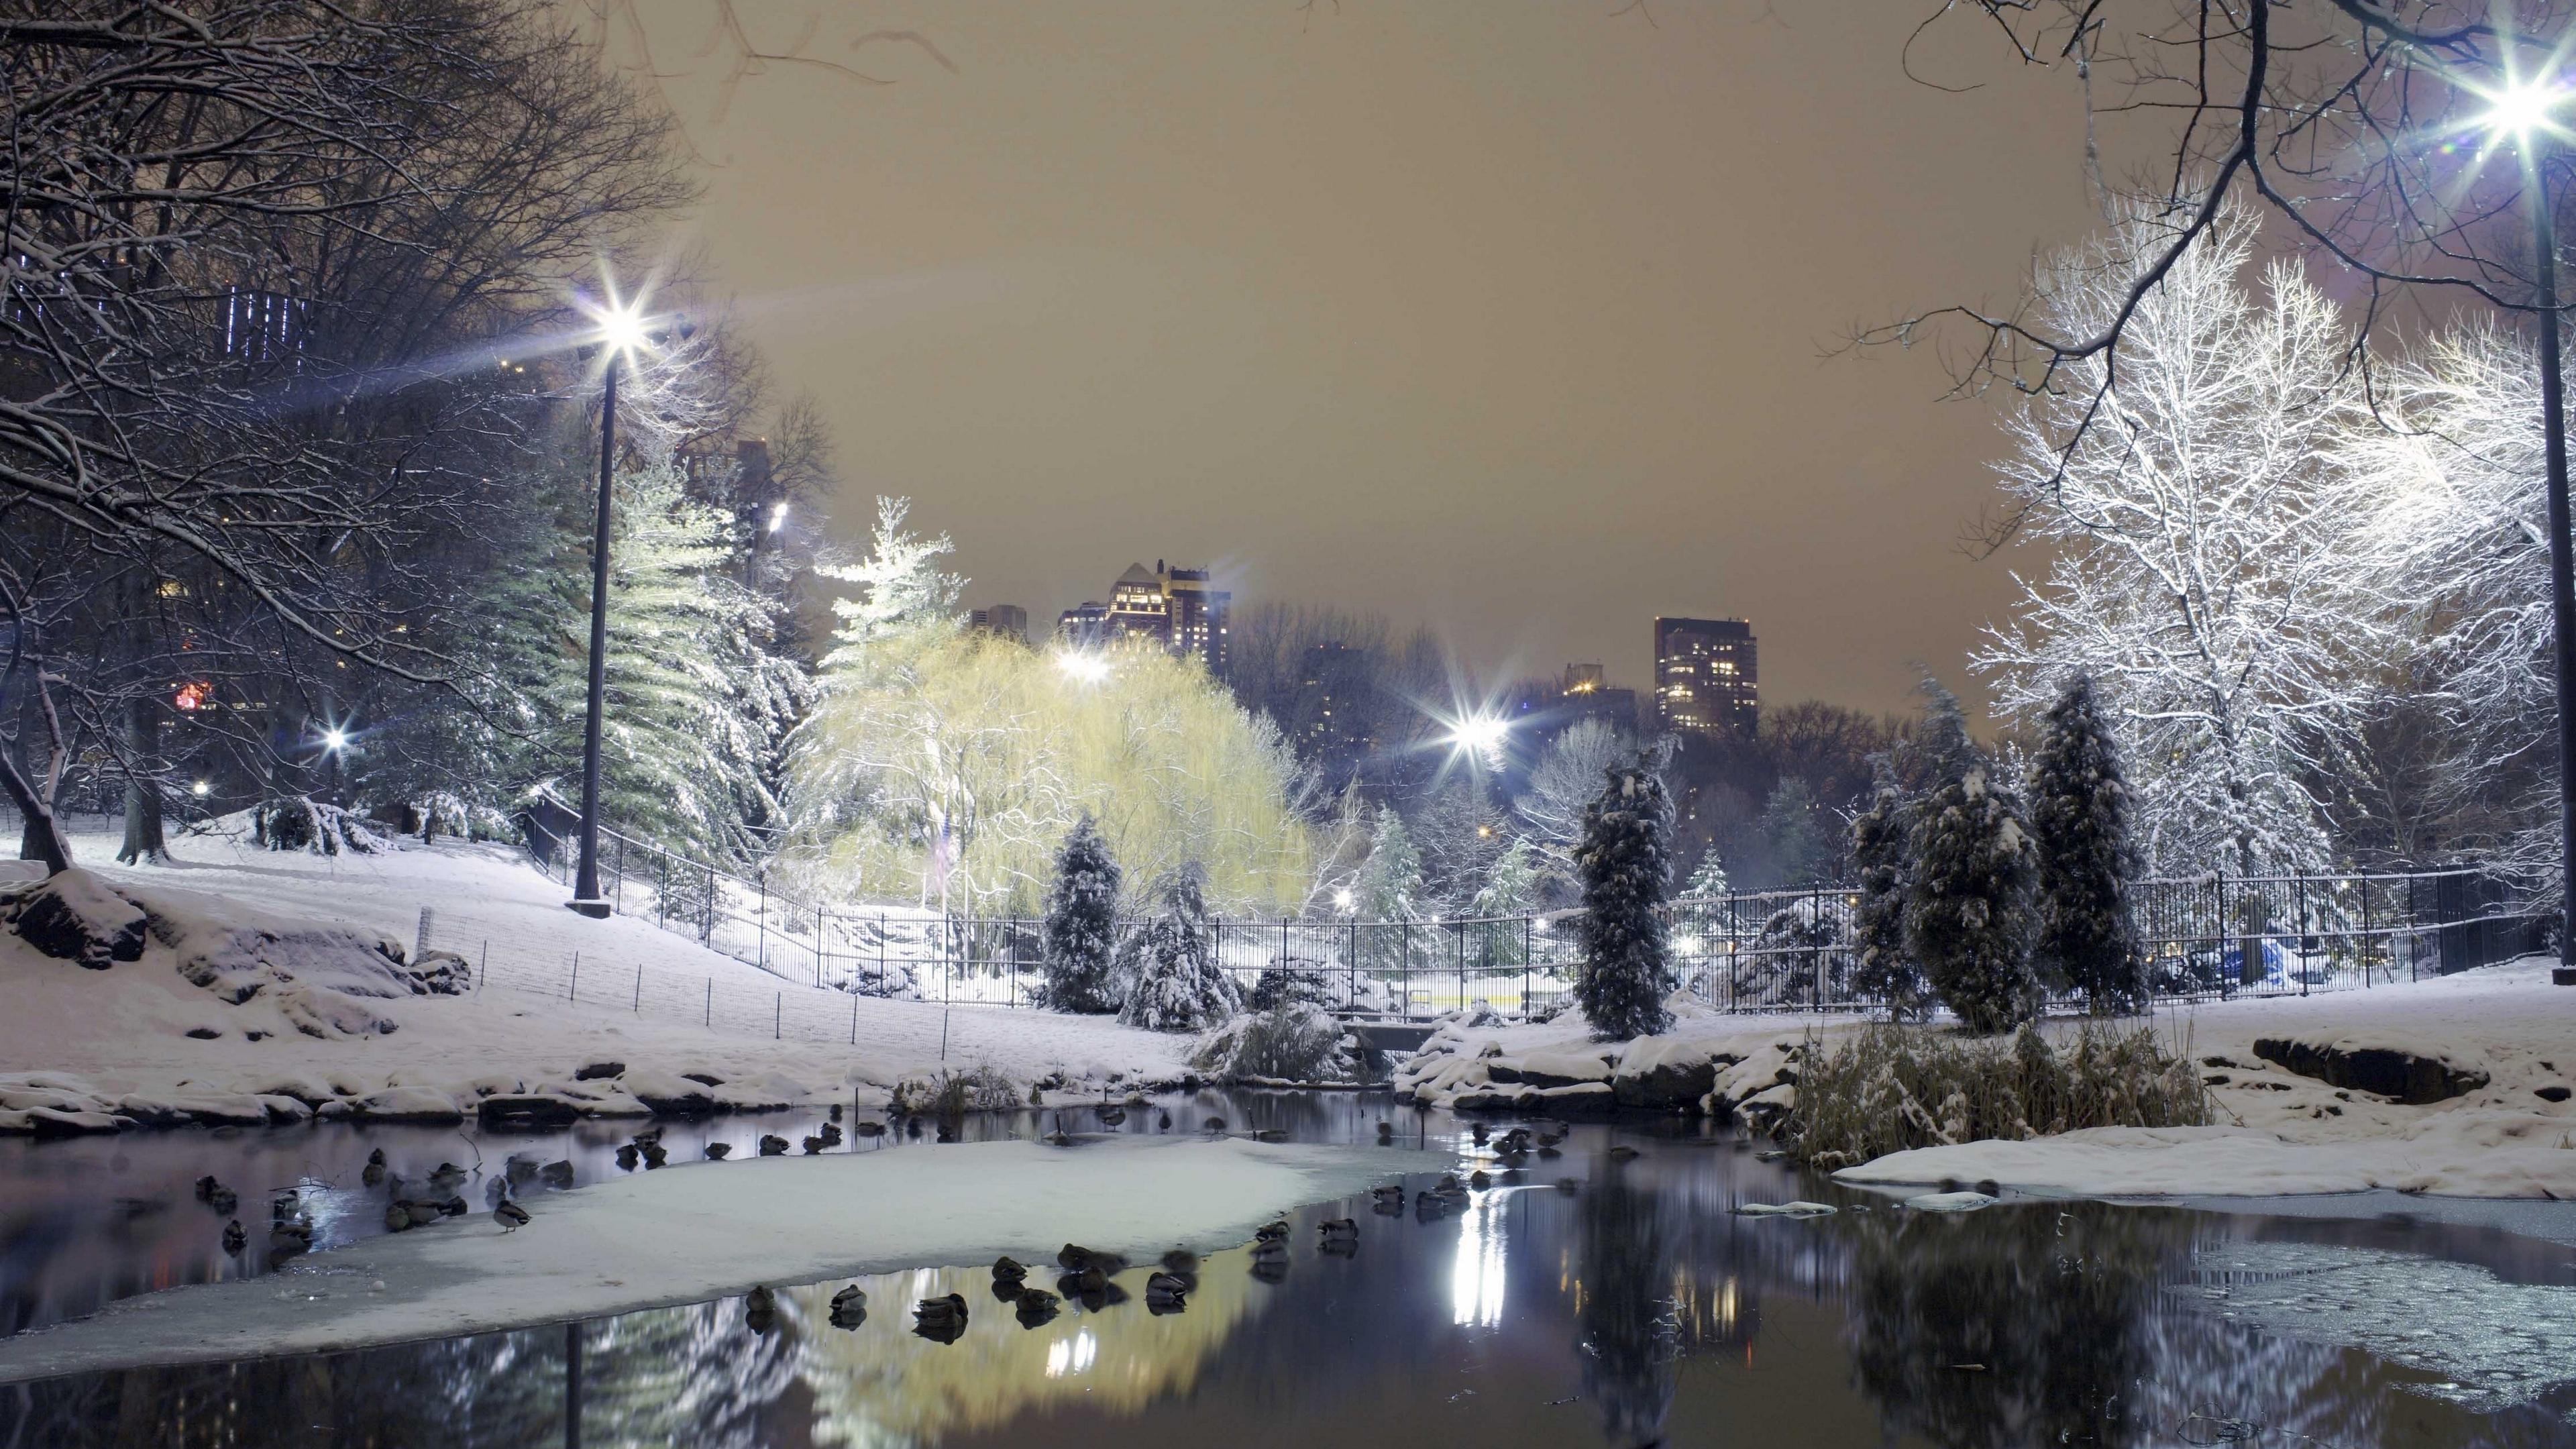 city park trees winter snow lights 4k 1538068521 - city, park, trees, winter, snow, lights 4k - Trees, Park, City